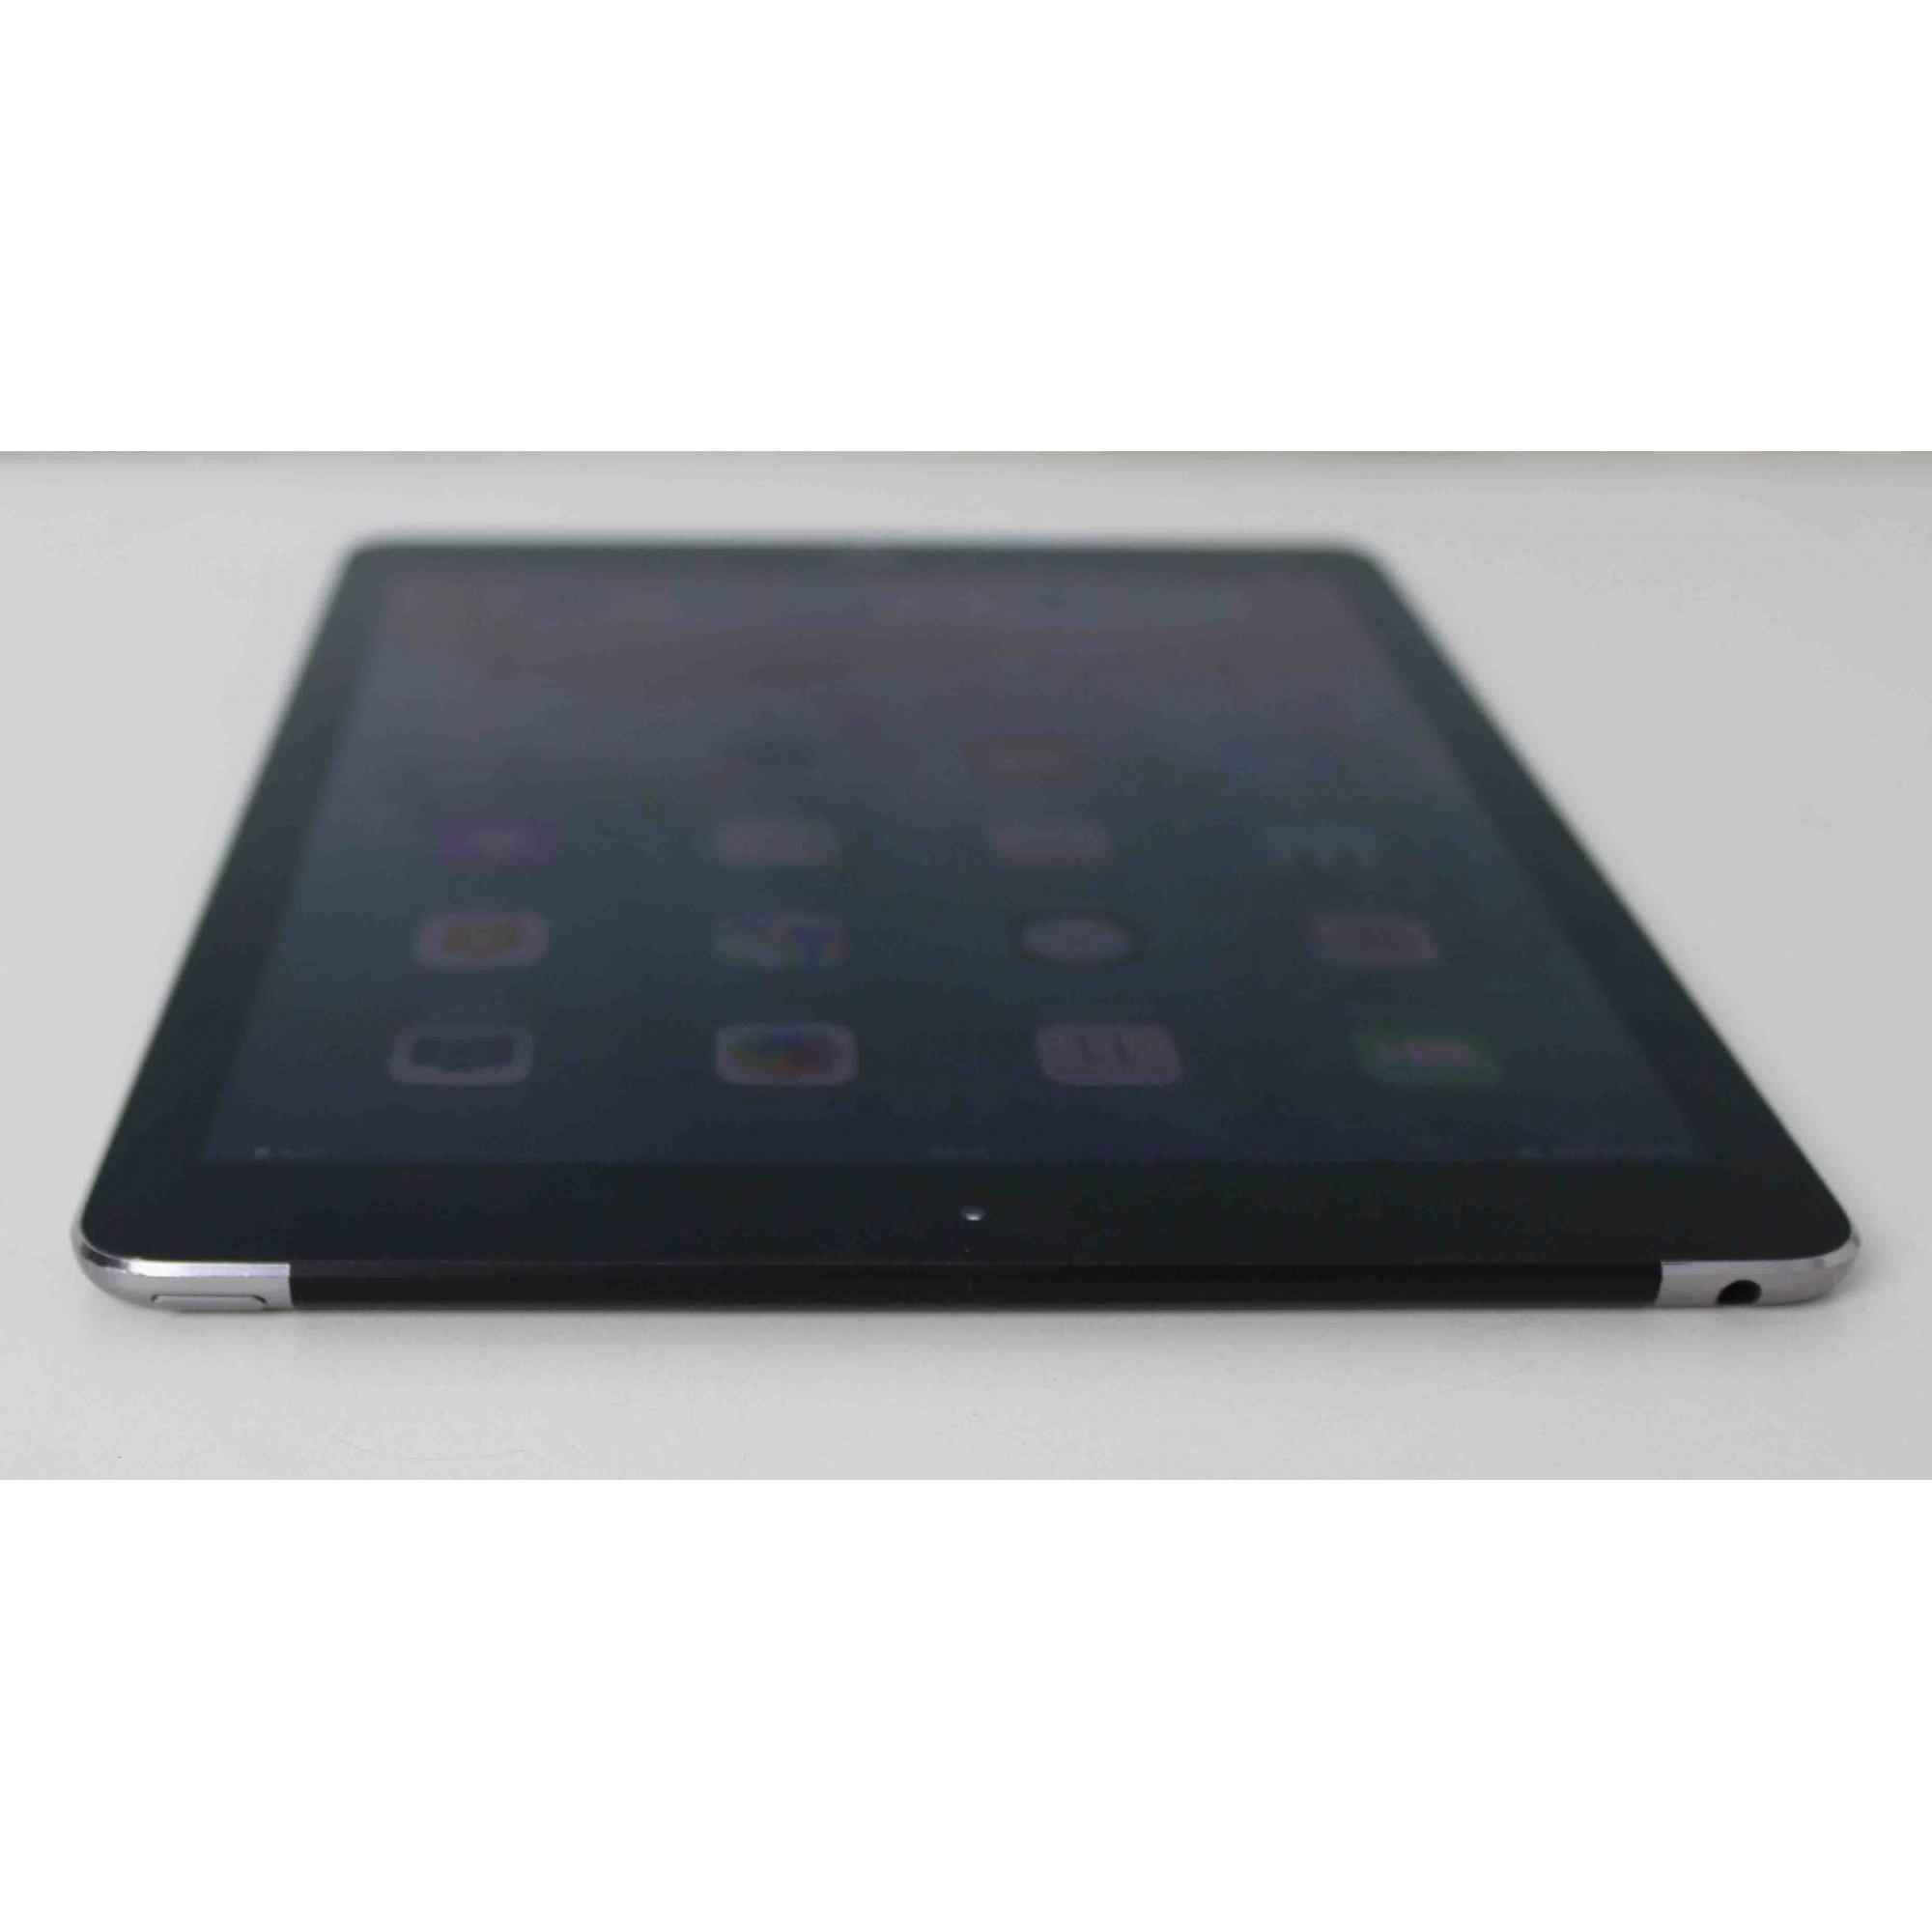 "iPad Air 2 MGWL2BZ/A 9.7"" 128GB Wifi + 4G - Cinza Espacial"